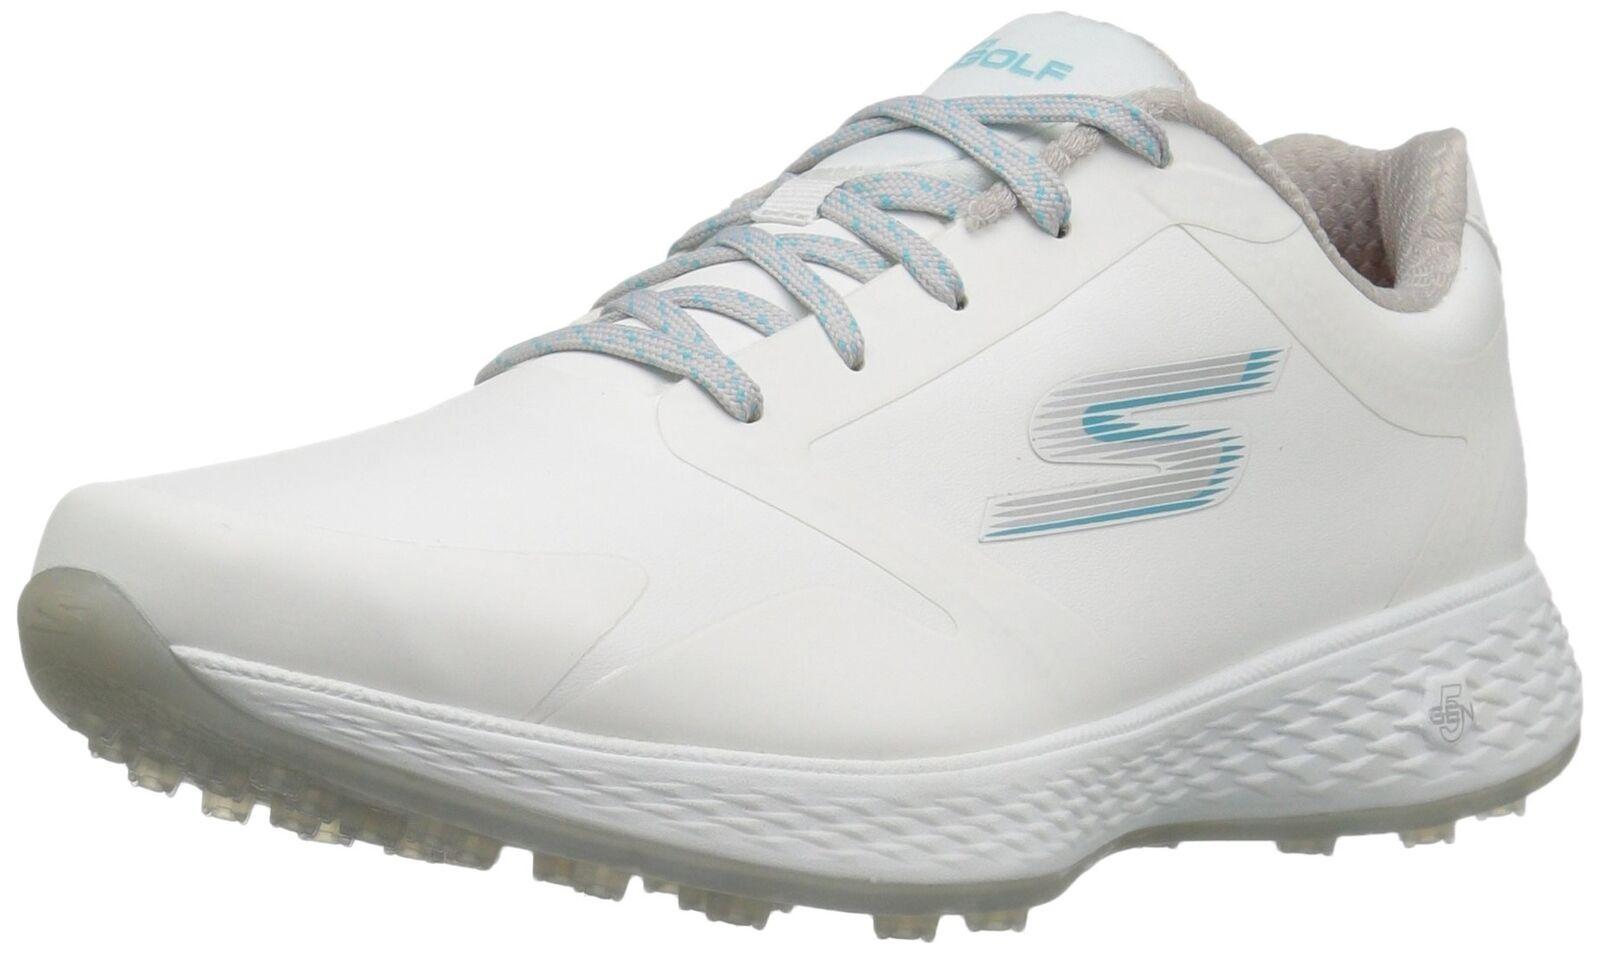 Skechers Performance Women's Go Golf Elite 2 Tour Golf Shoe White/Blue